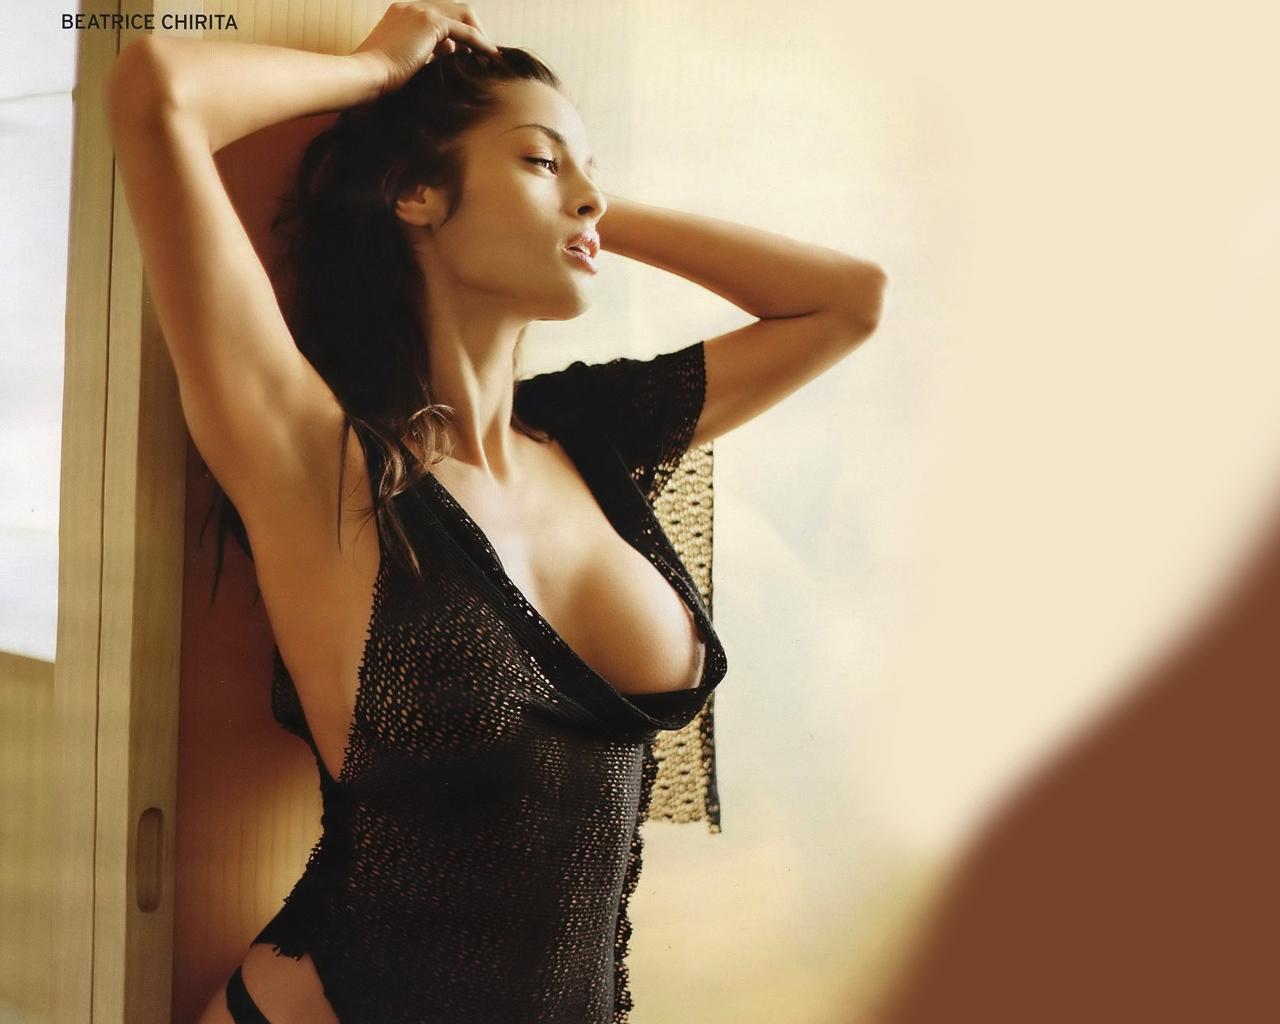 http://4.bp.blogspot.com/-kMKOLfZ2rB4/UPlimN2csrI/AAAAAAAAAec/sppJpdV2I9I/s1600/Beatrice+Chirita+Wallpaper-1.jpg